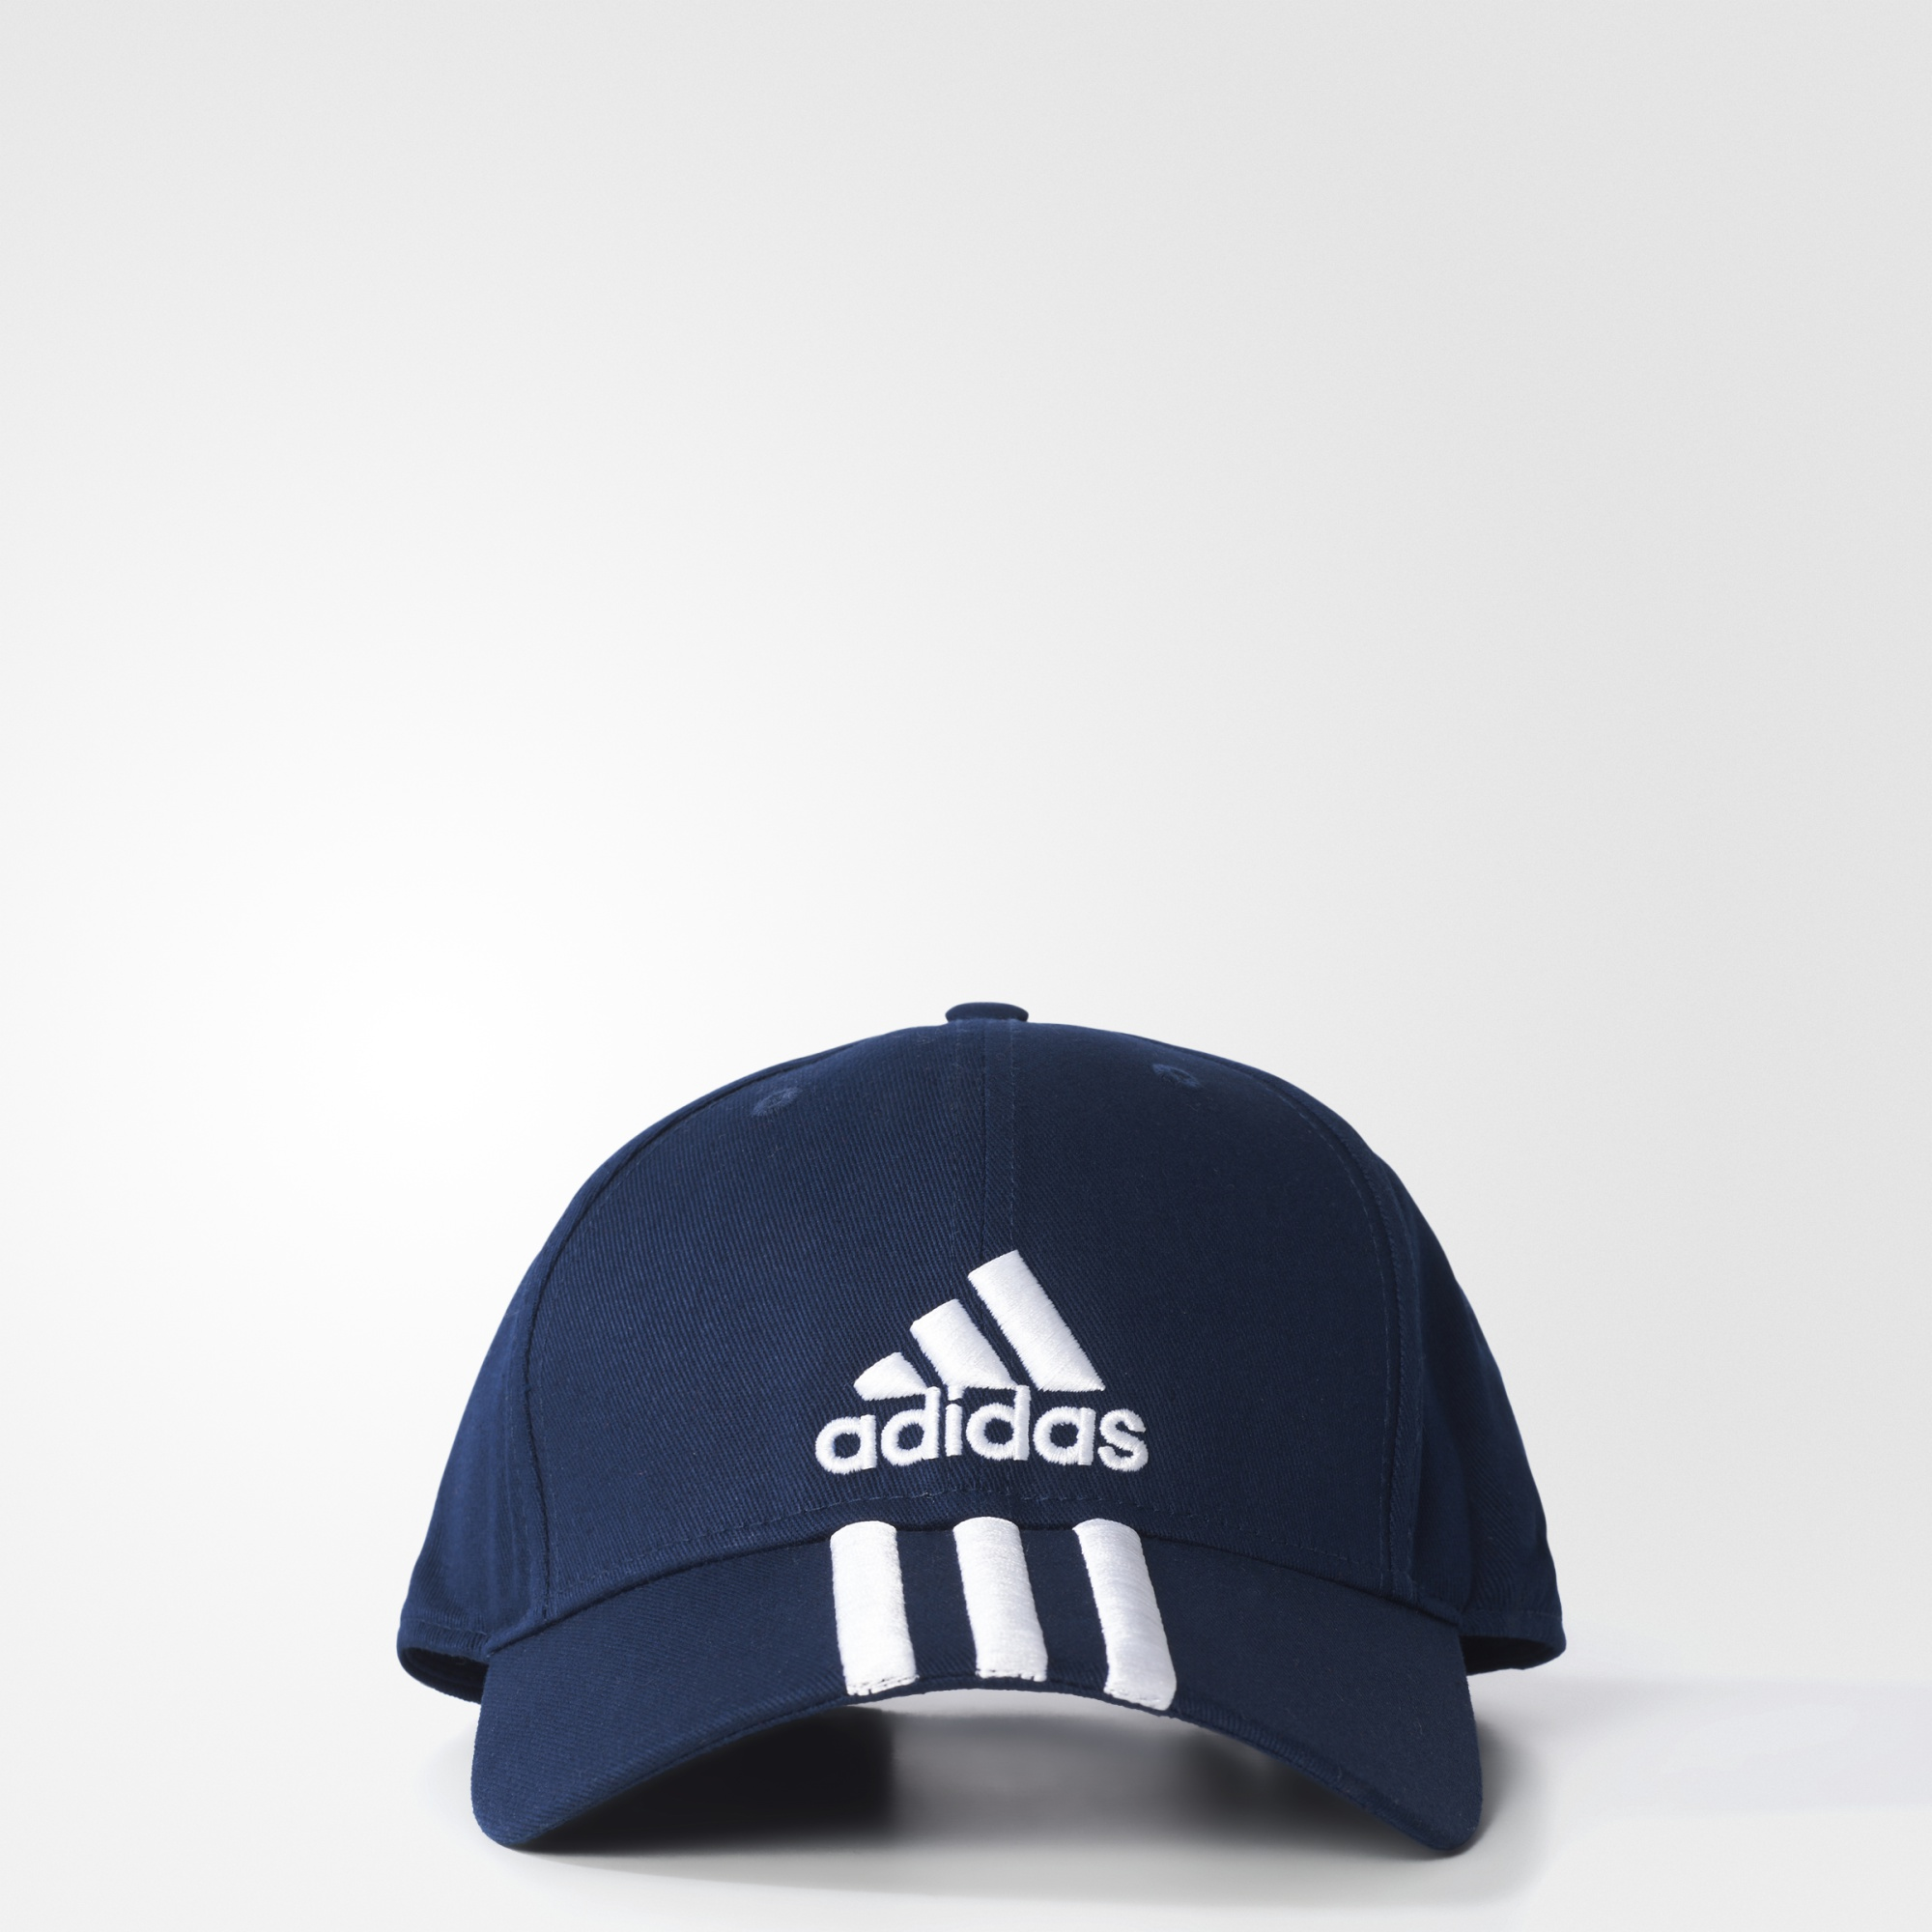 adidas Performance 3-Stripes Hat - Blue  330a27e1a43